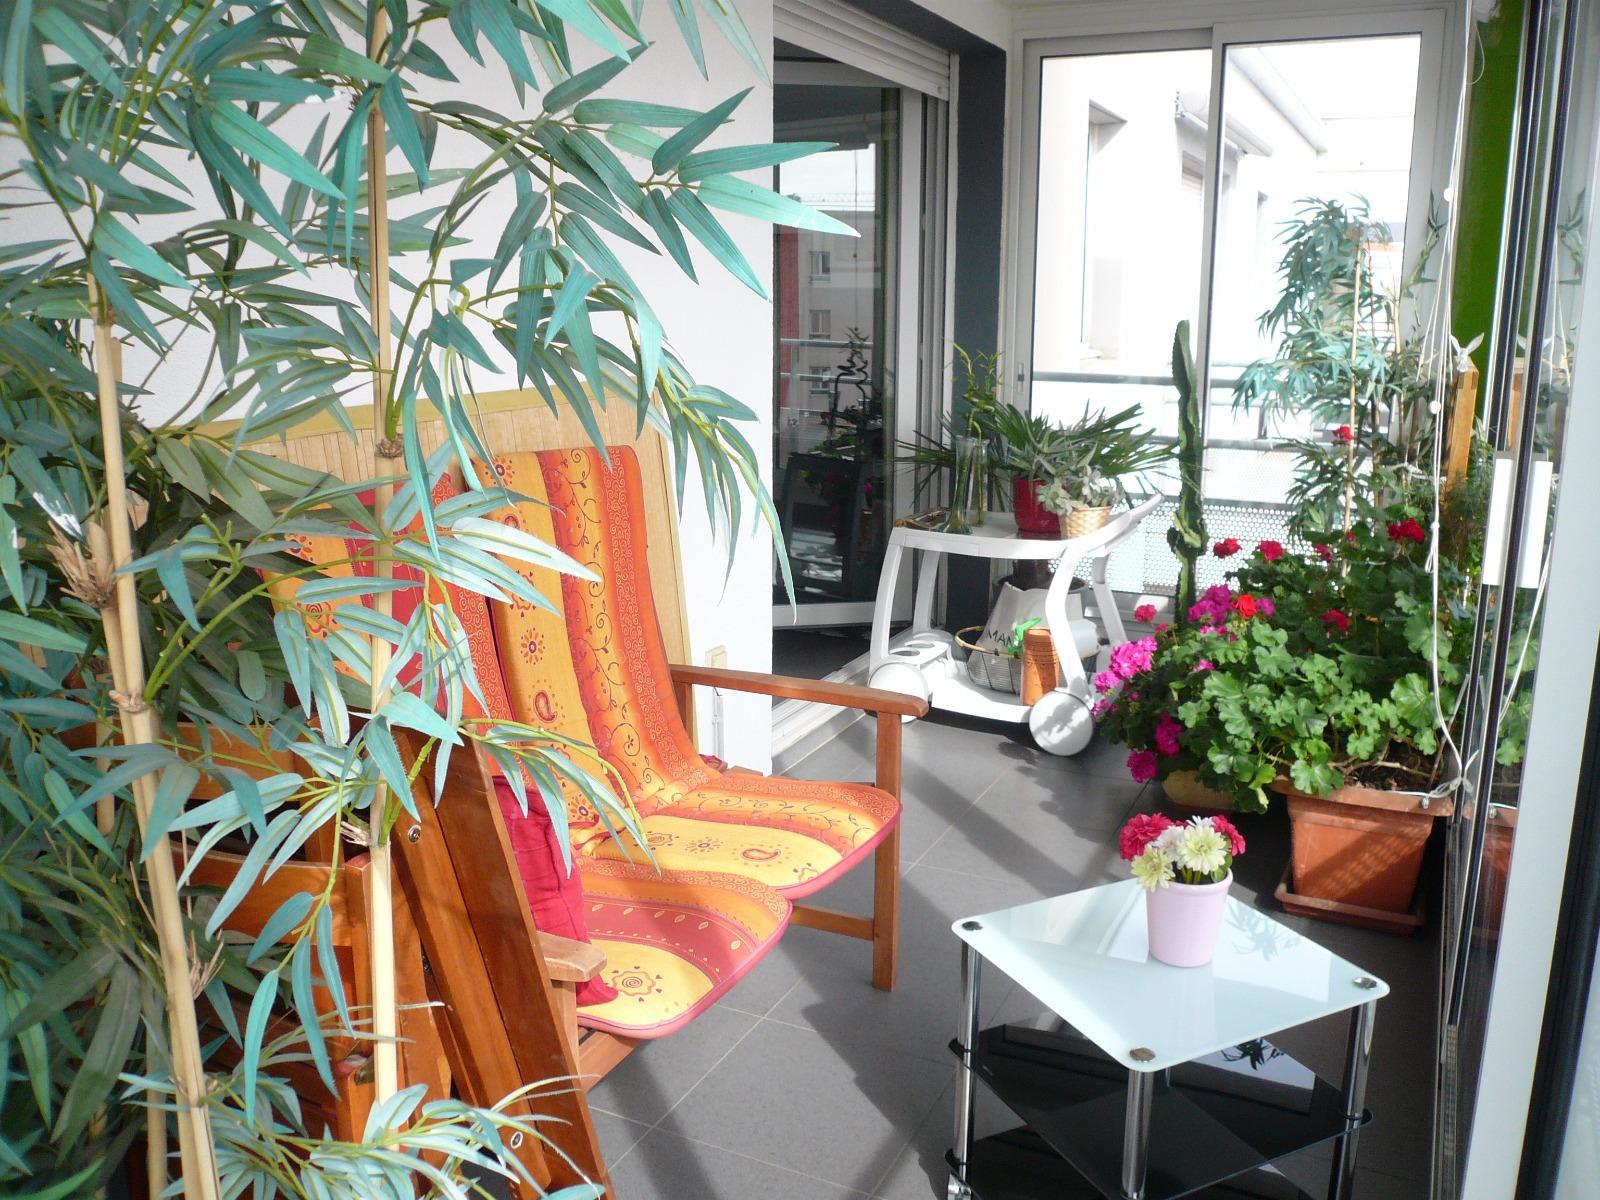 Appartement montpellier montpellier port marianne rives du lez appartement t4 dernier etage - Appartement port marianne montpellier ...